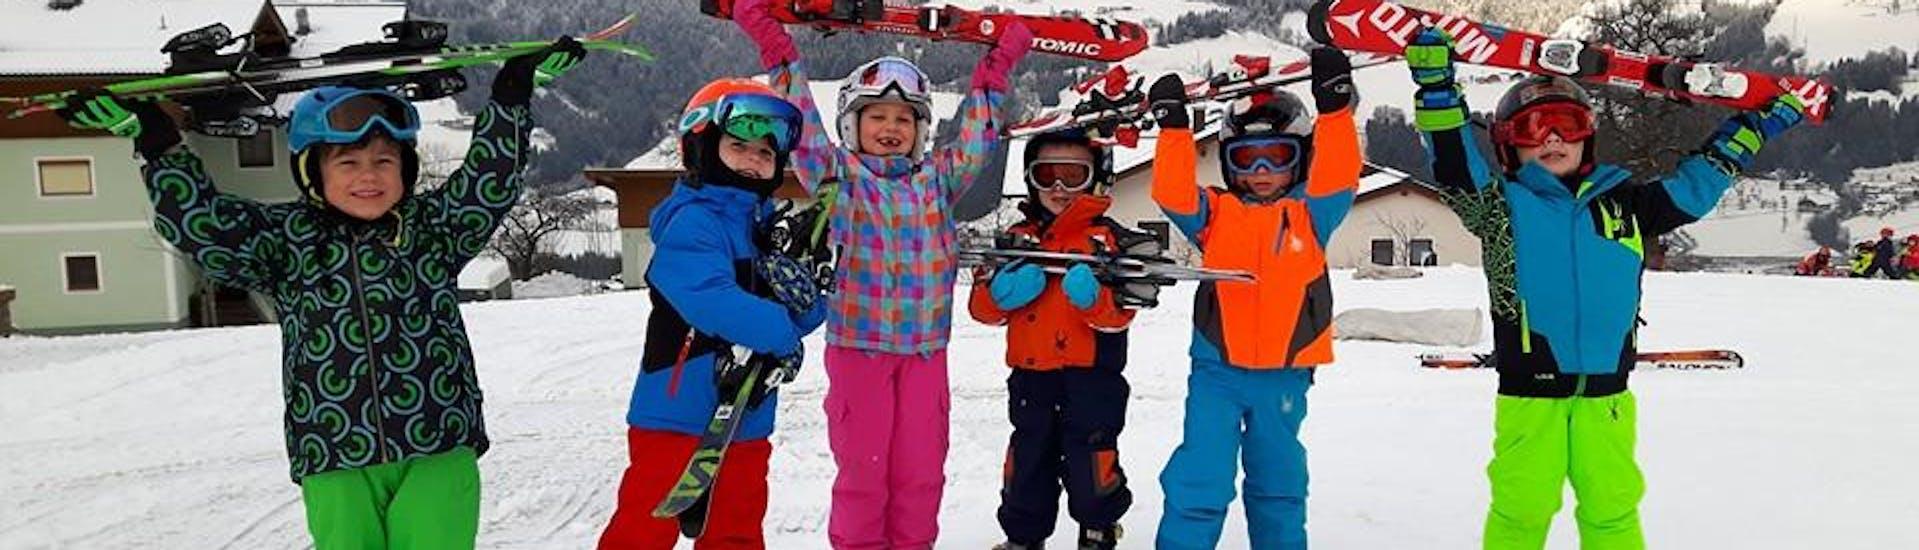 Ski & Play Lessons for Kids (3-4 years) - Beginners avec Skischule Toni Gruber Alpendorf - Hero image